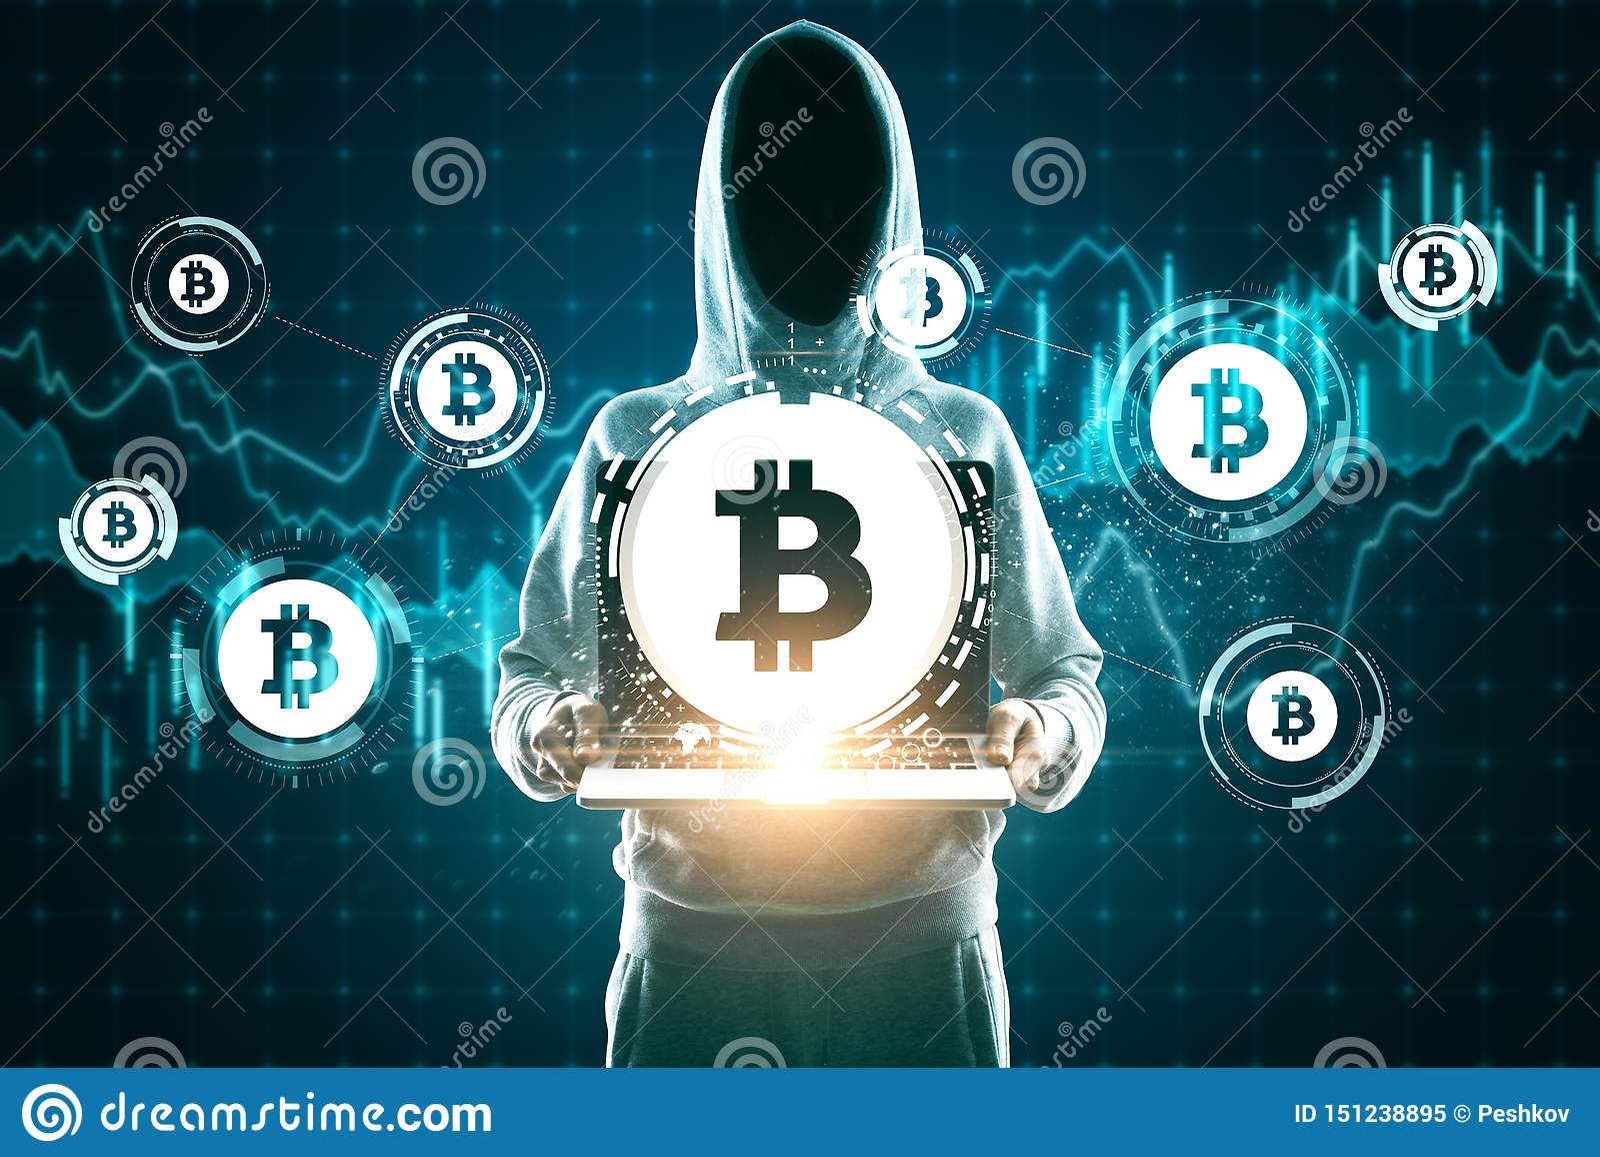 Hacker bitcoins fury ustinov bettingadvice